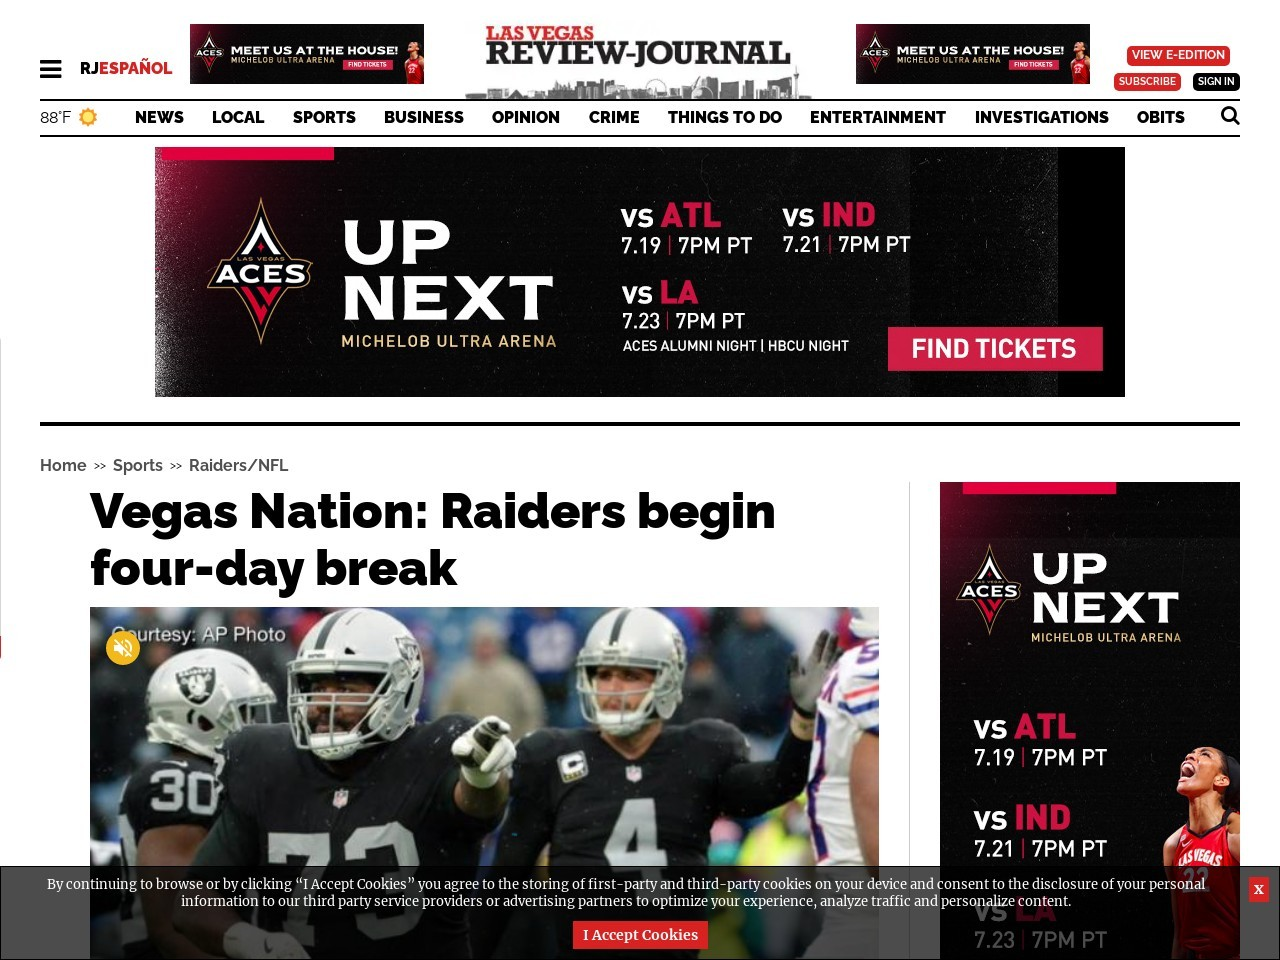 Vegas Nation: Raiders begin four-day break